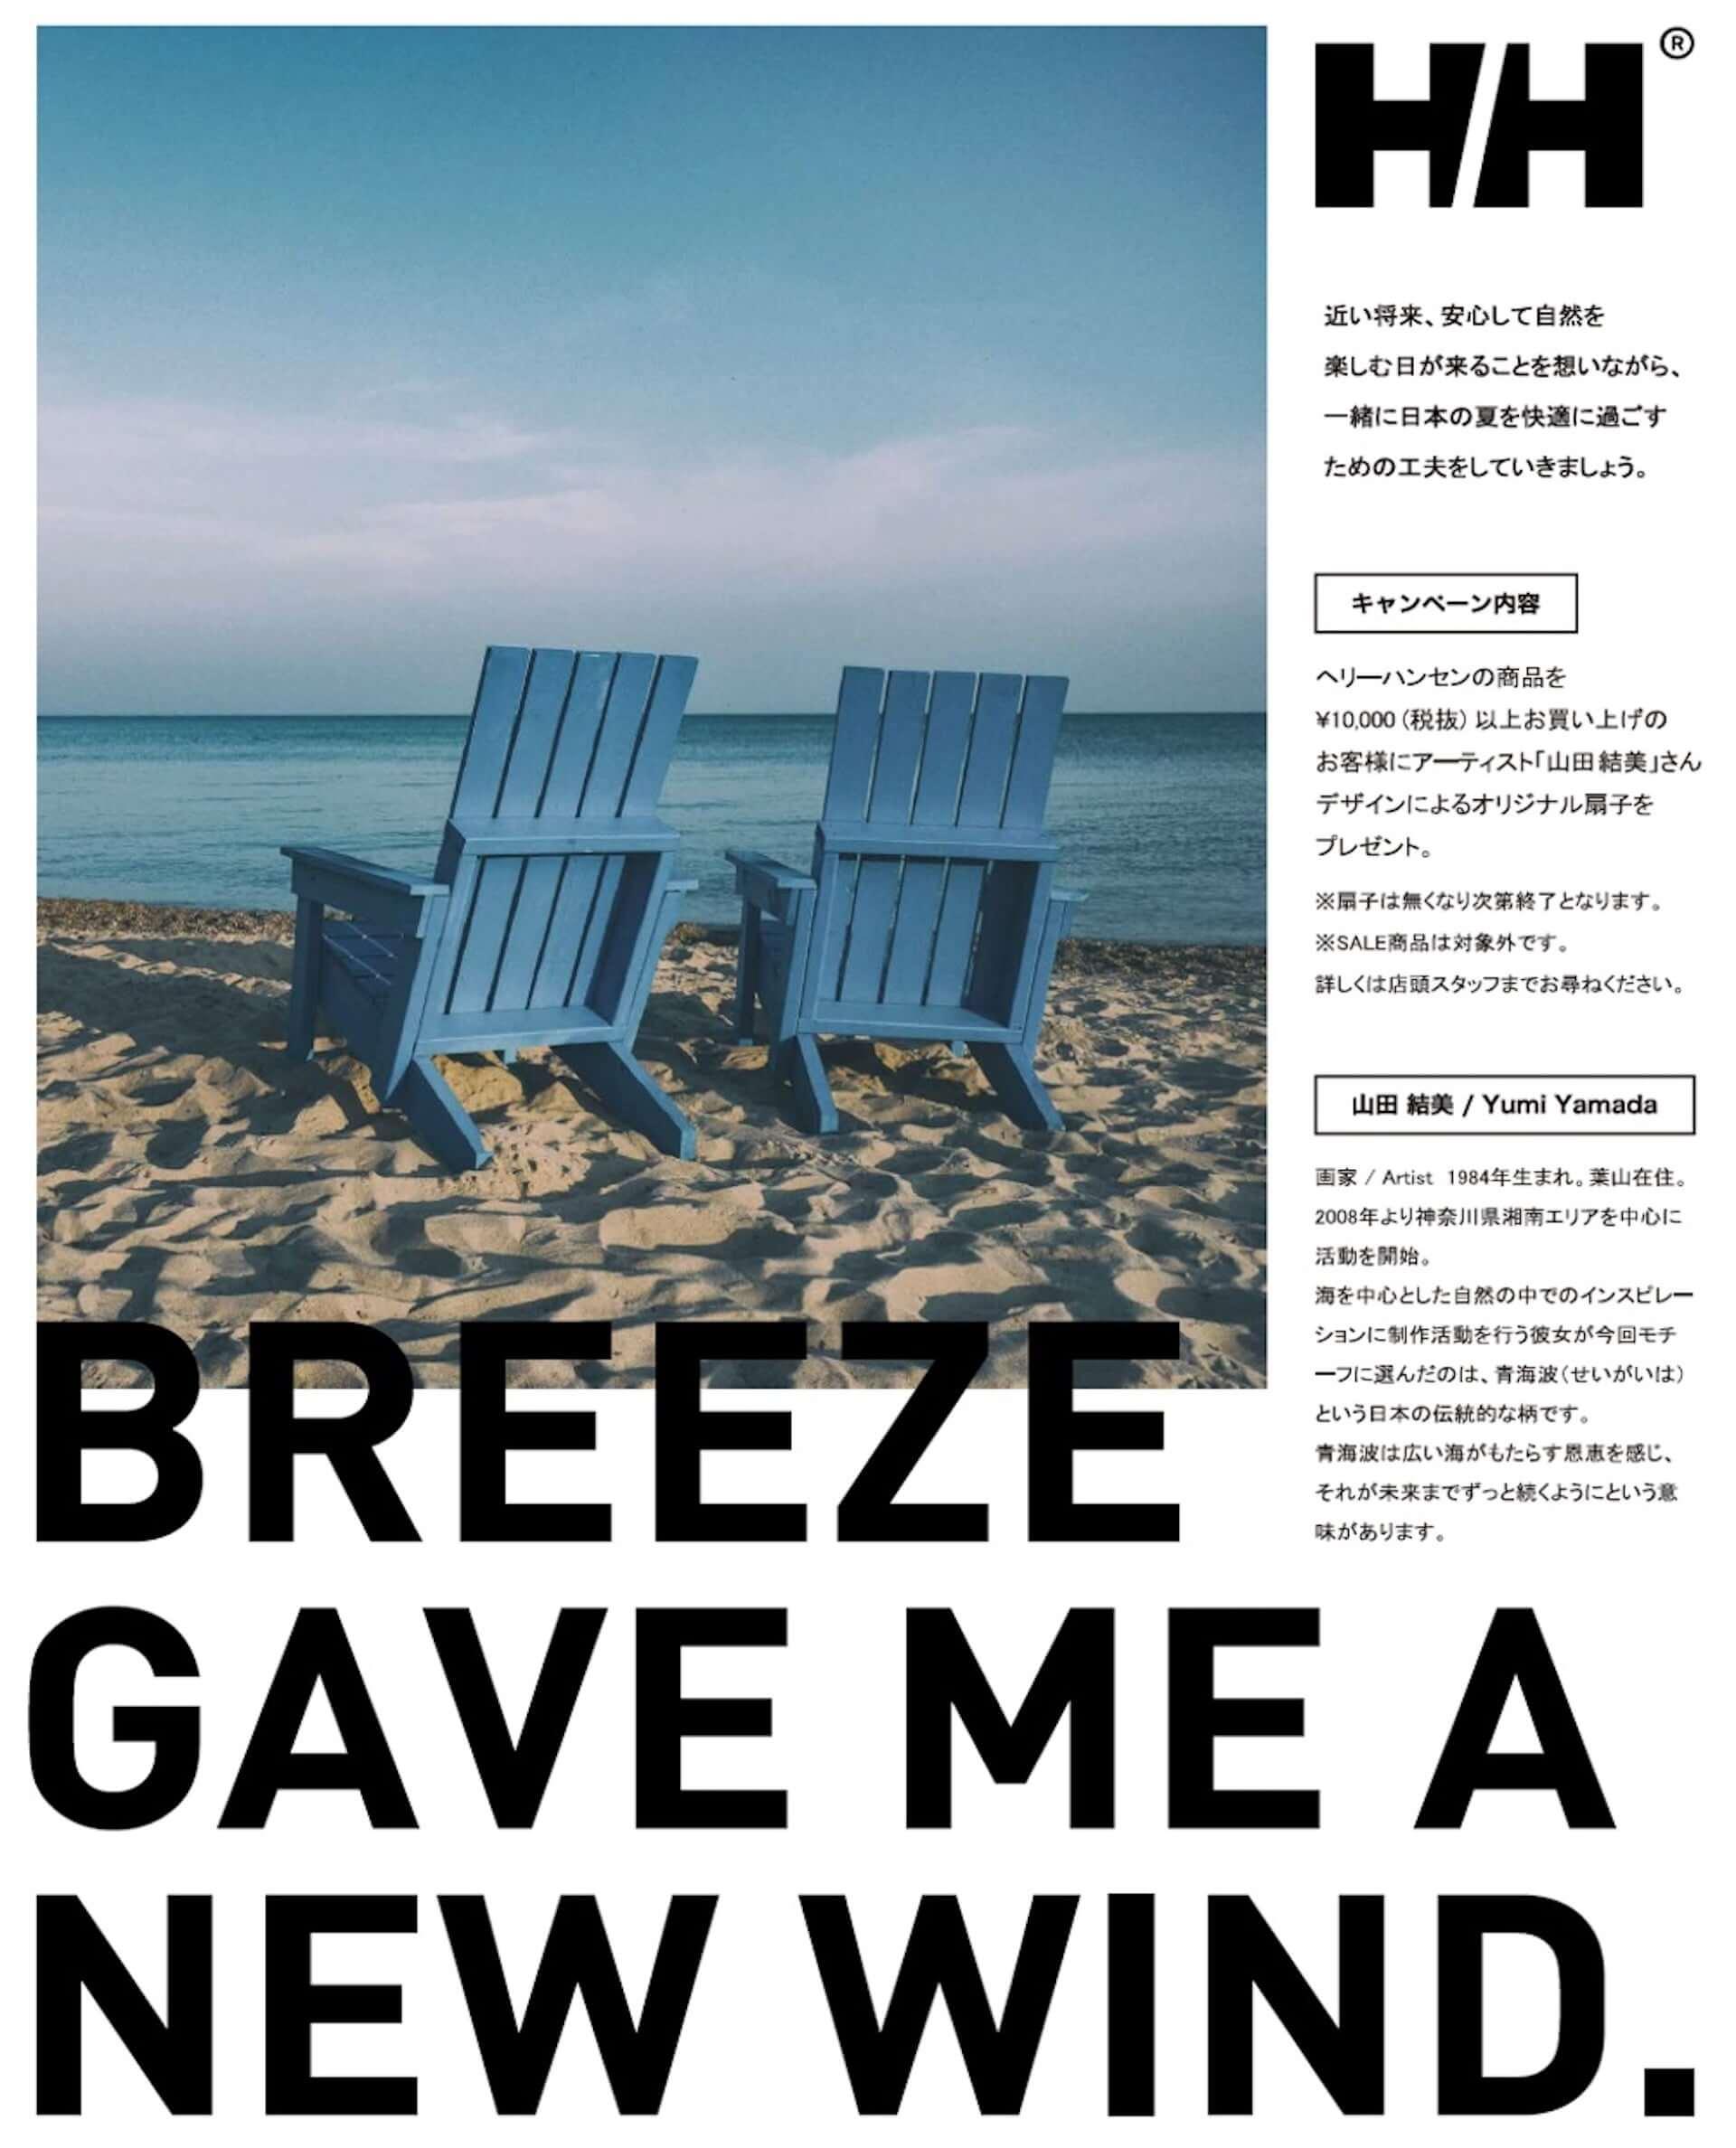 HELLY HANSENが今夏必見の新作ショーツシリーズを発売!山田結美デザインの扇子プレゼントキャンペーンも開始 lf200612_hellyhansen_10-1920x2376